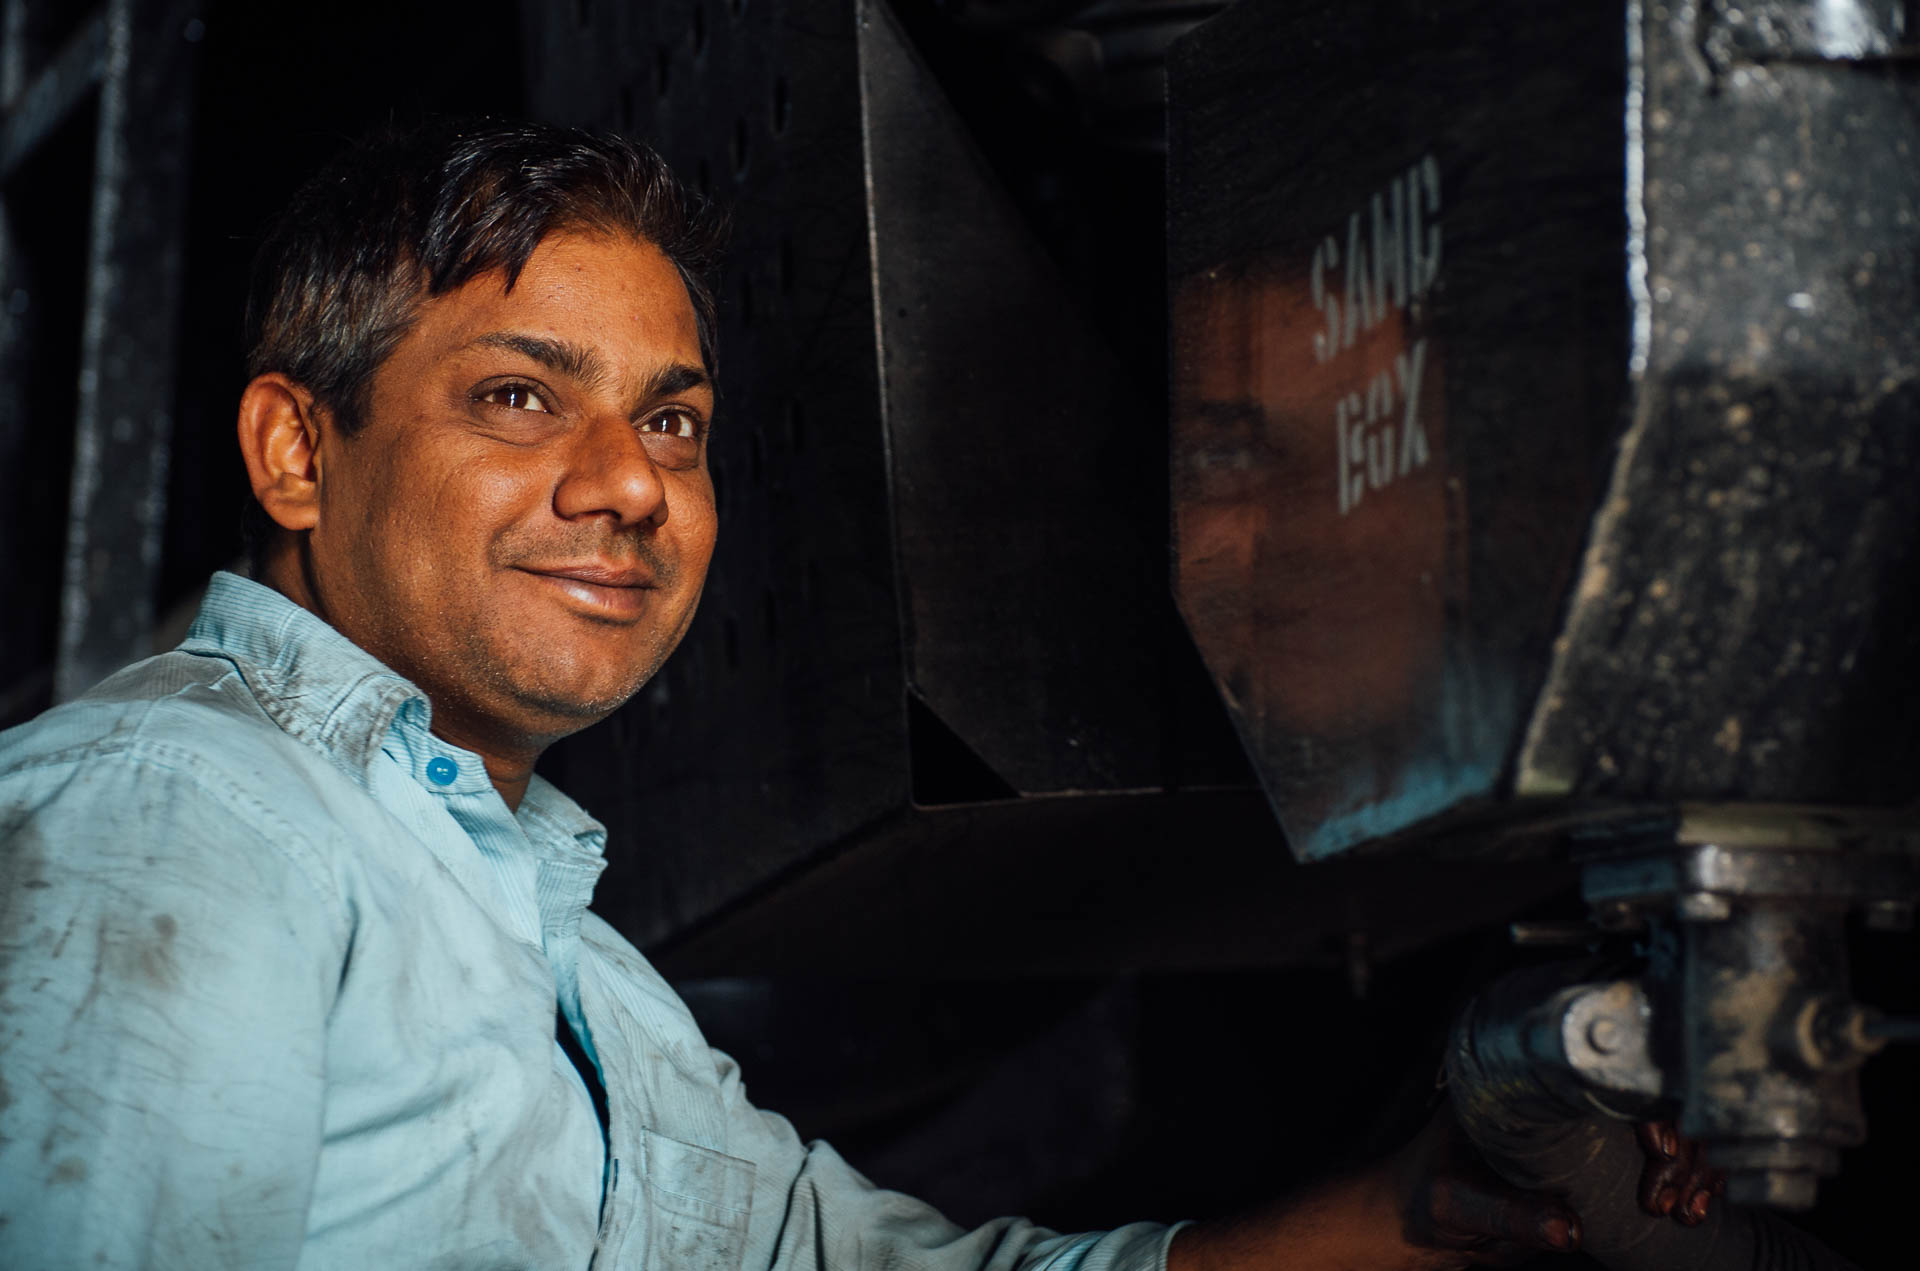 Arbeiter Indien Fotograf Tobi Bohn Berlin